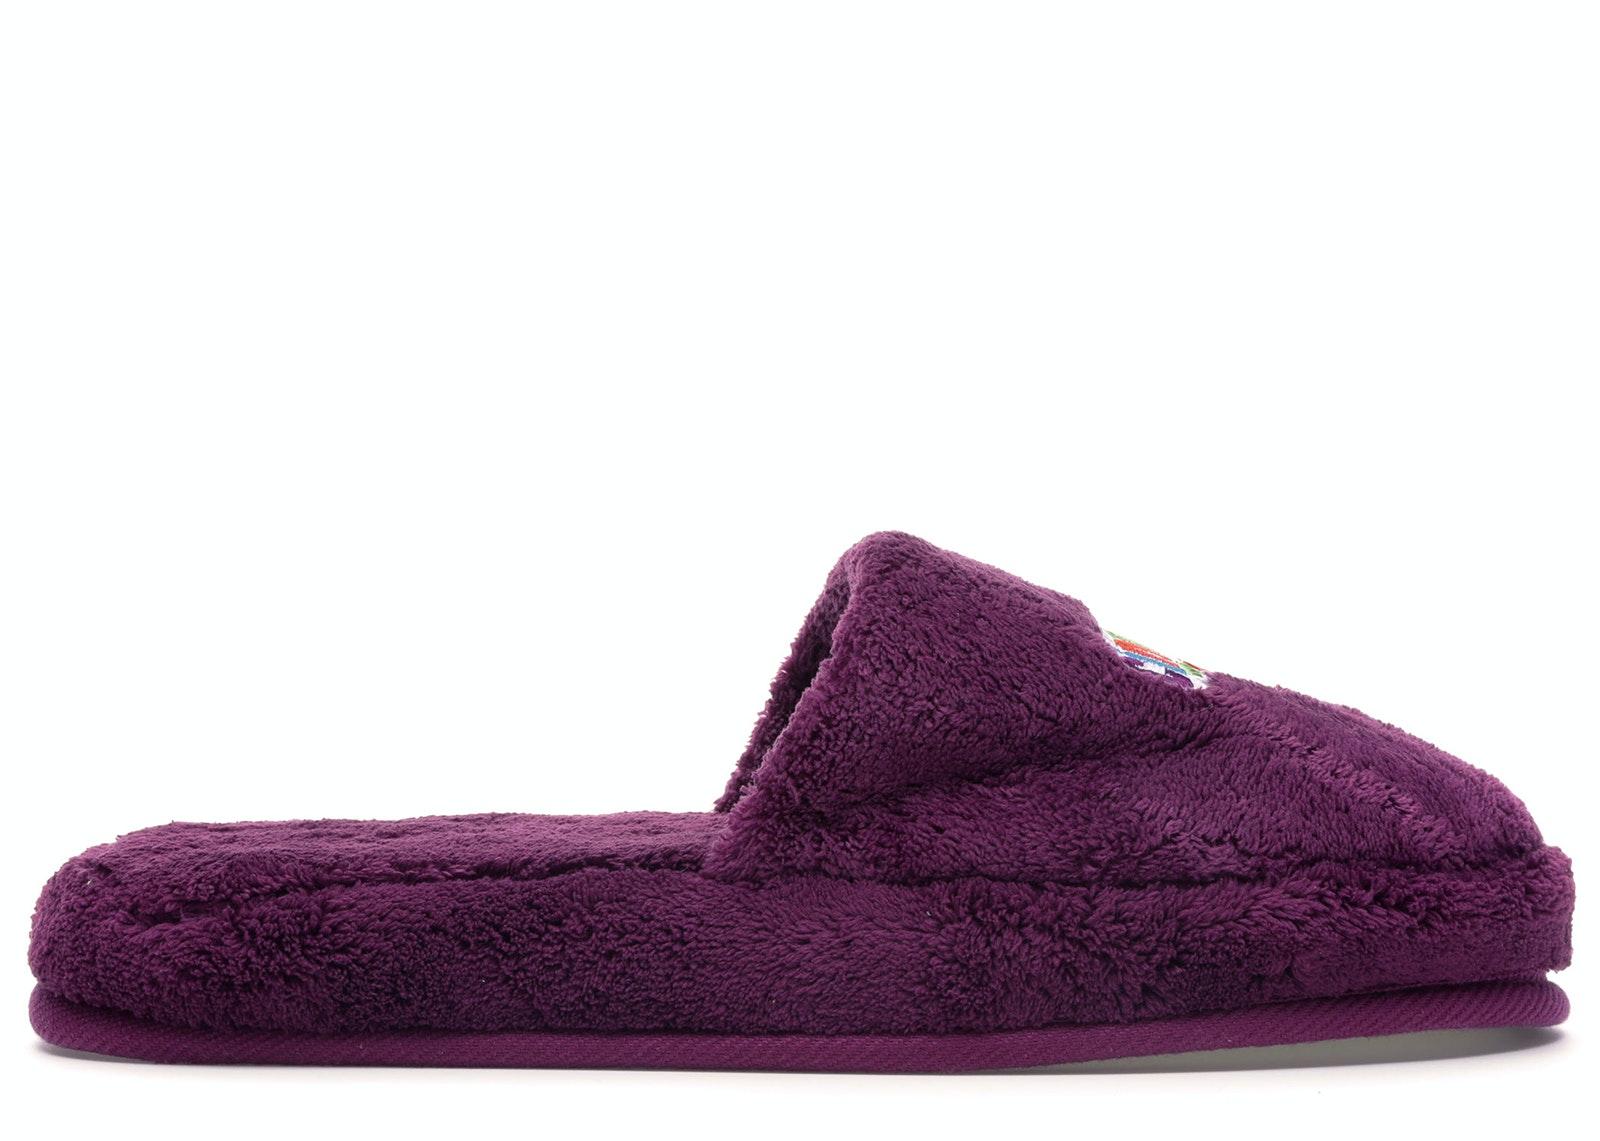 Kith Treats x Cinnamon Toast Crunch Slippers Purple